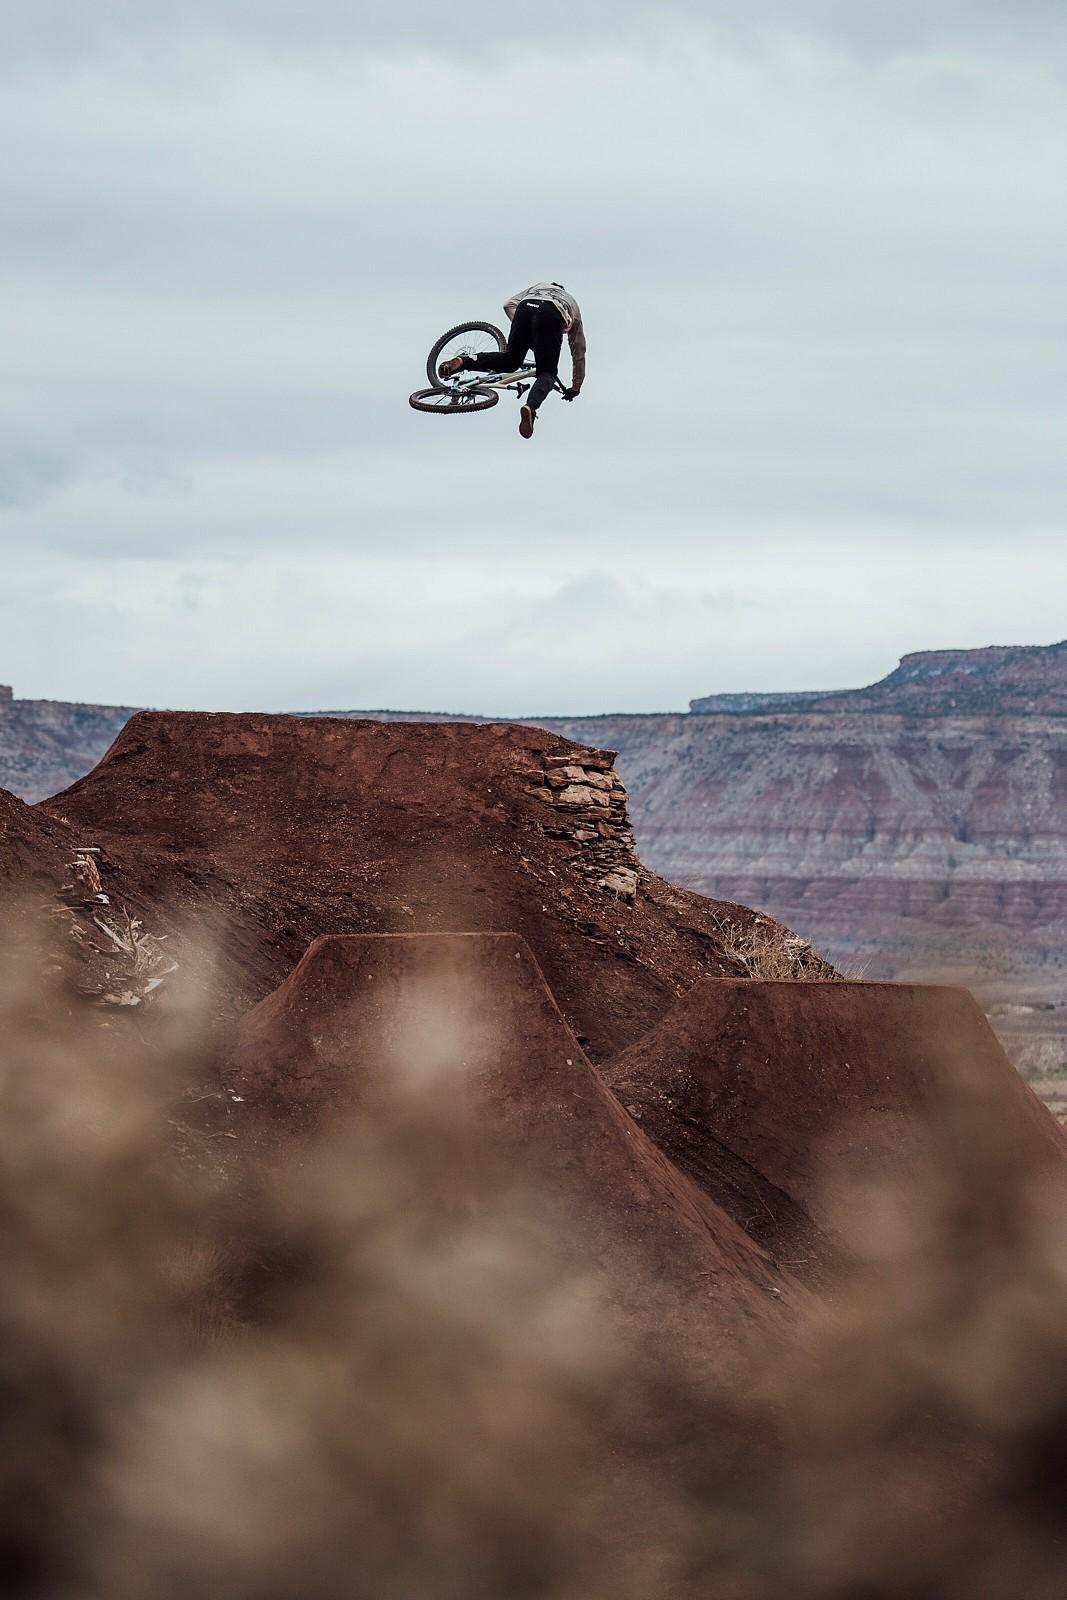 Kyle Strait - 2021 Red Bull Rampage Photos - Mountain Biking Pictures - Vital MTB